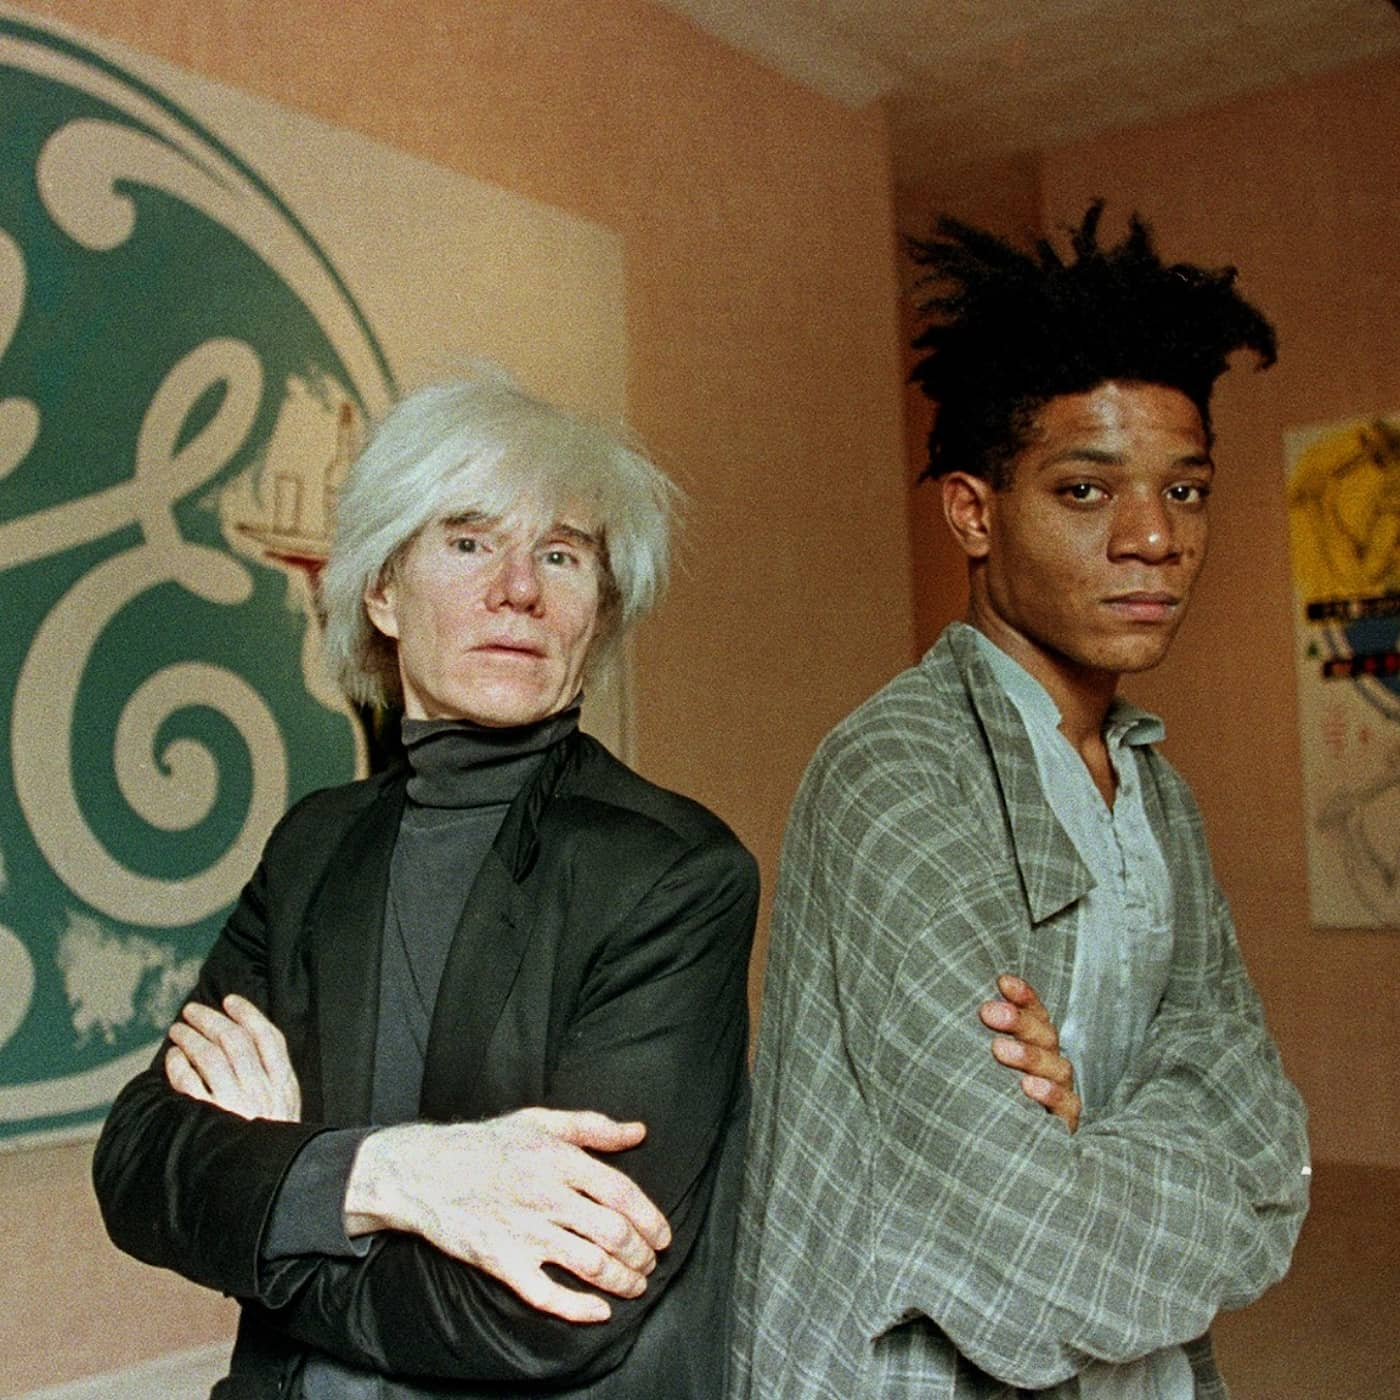 Missbrukad i modesammanhang? – konstnären Jean-Michel Basquiat